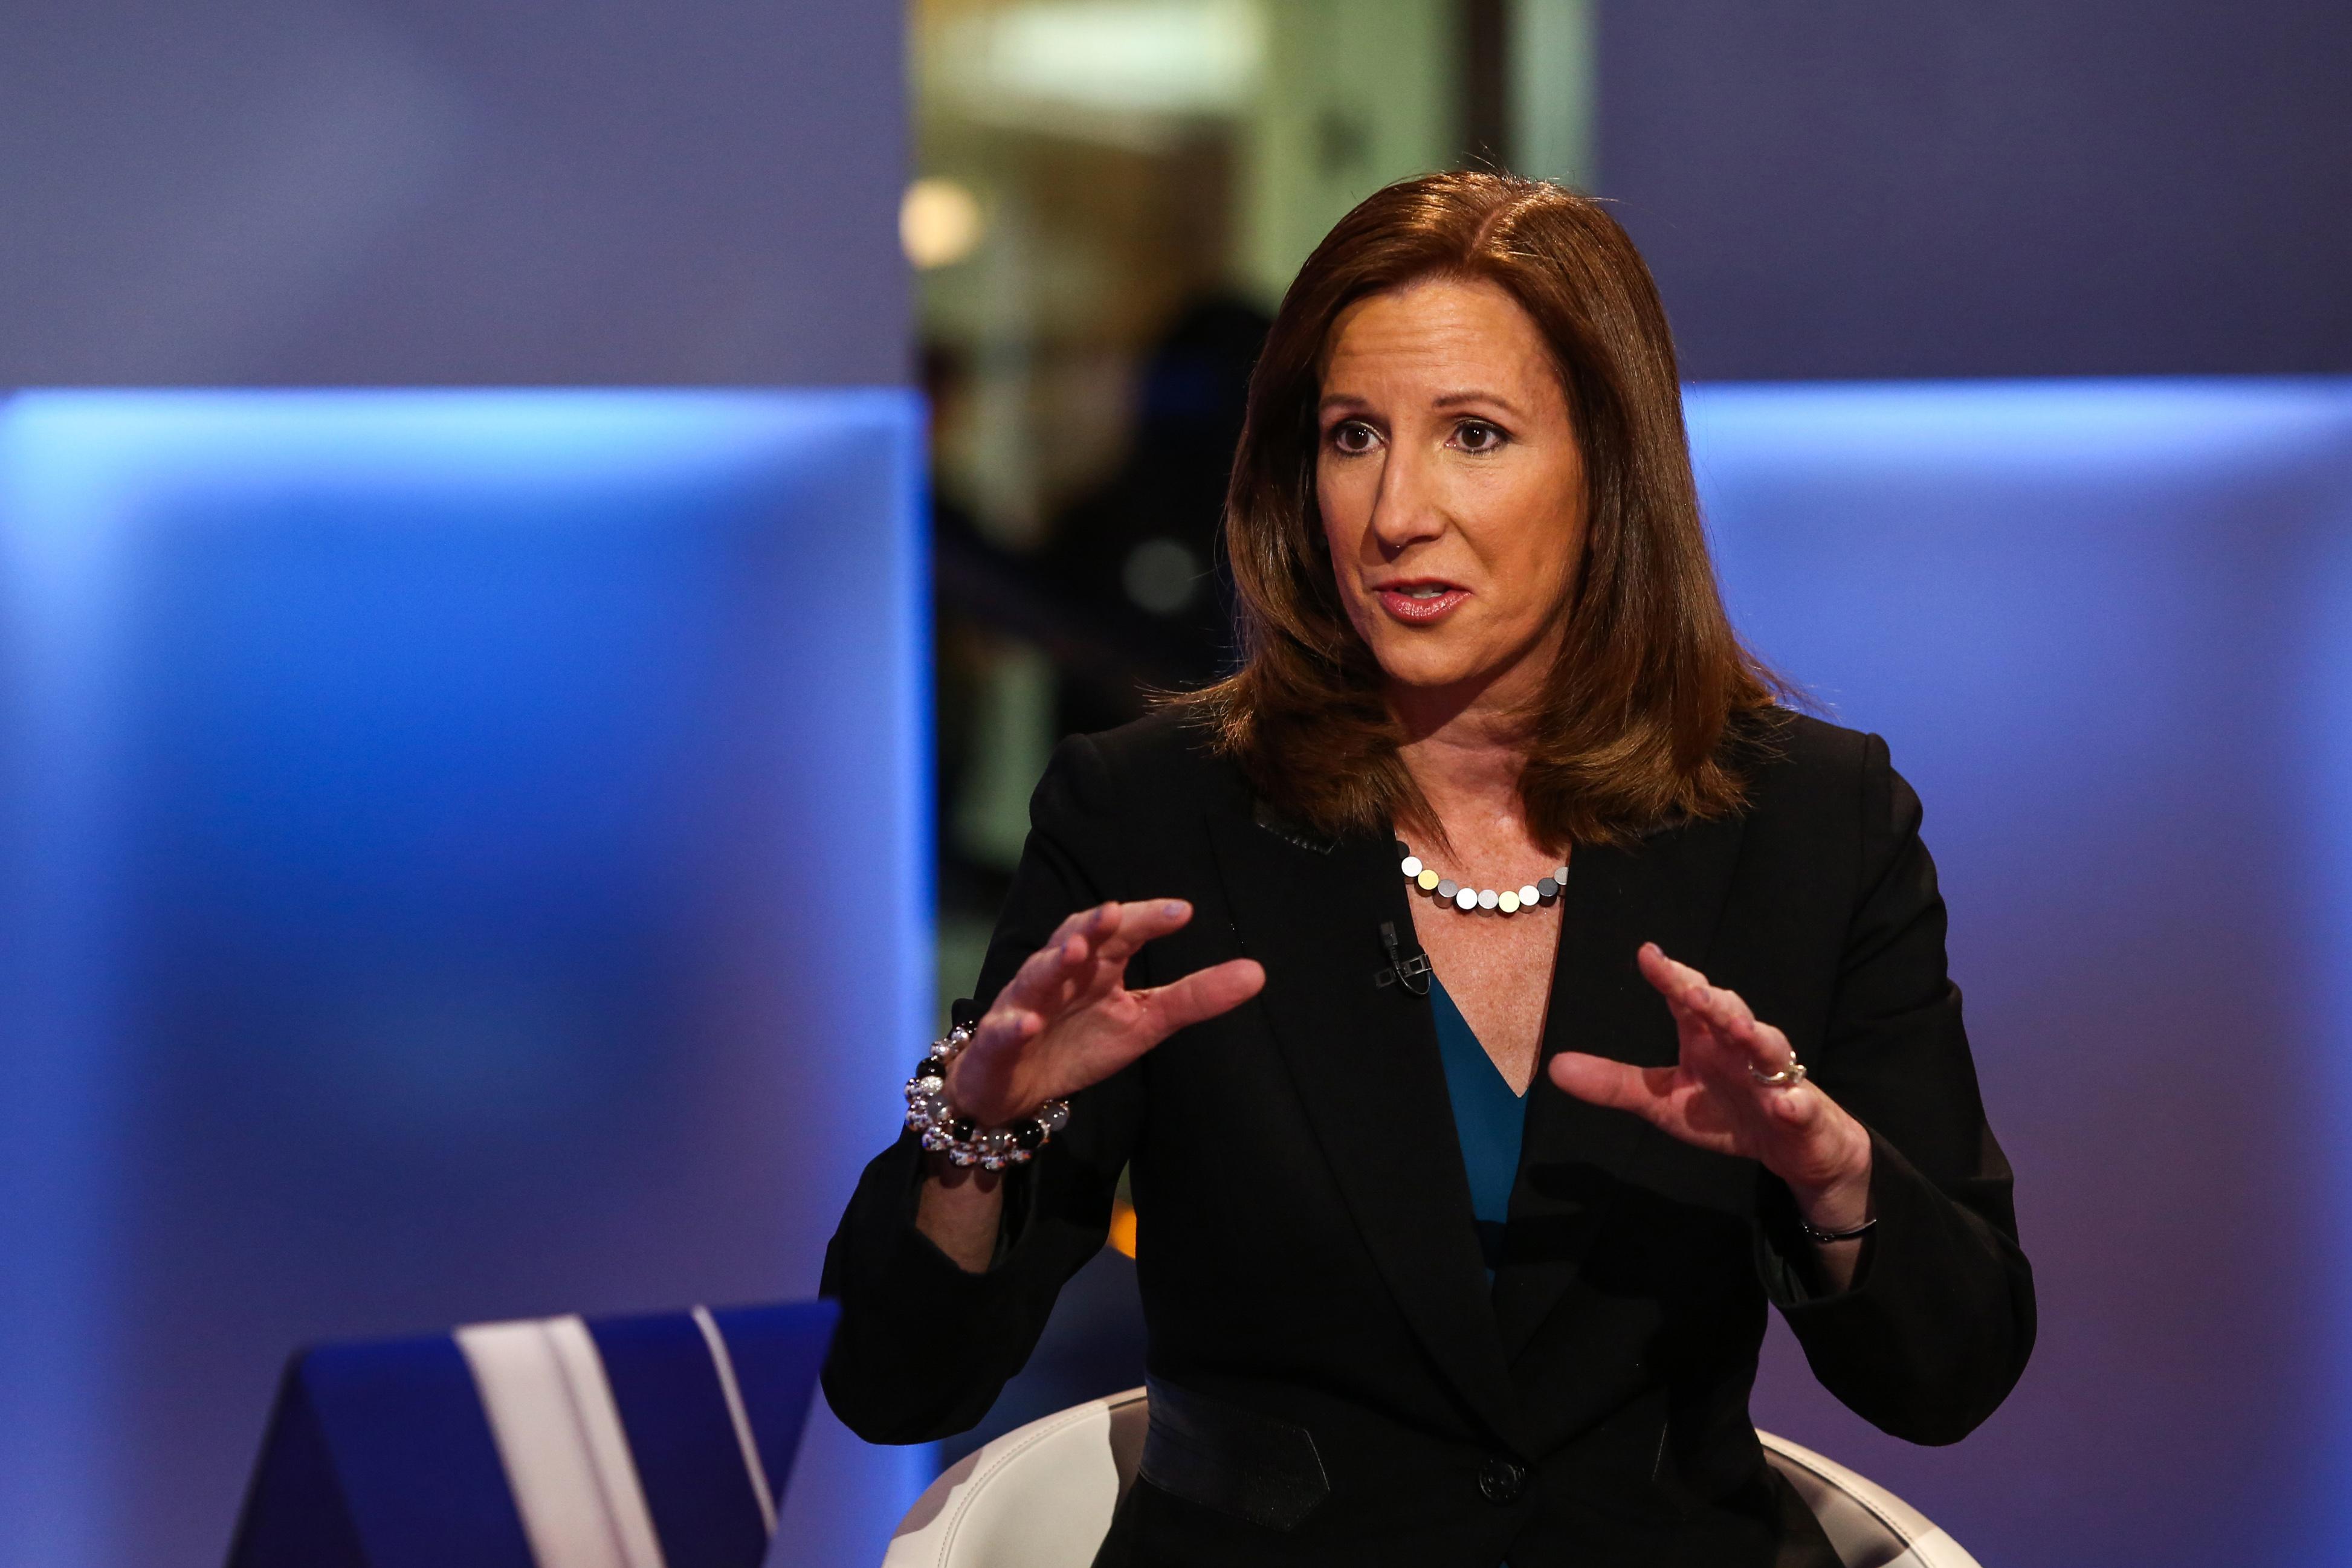 Deloitte LLP Chief Executive Officer Cathy Engelbert Interview